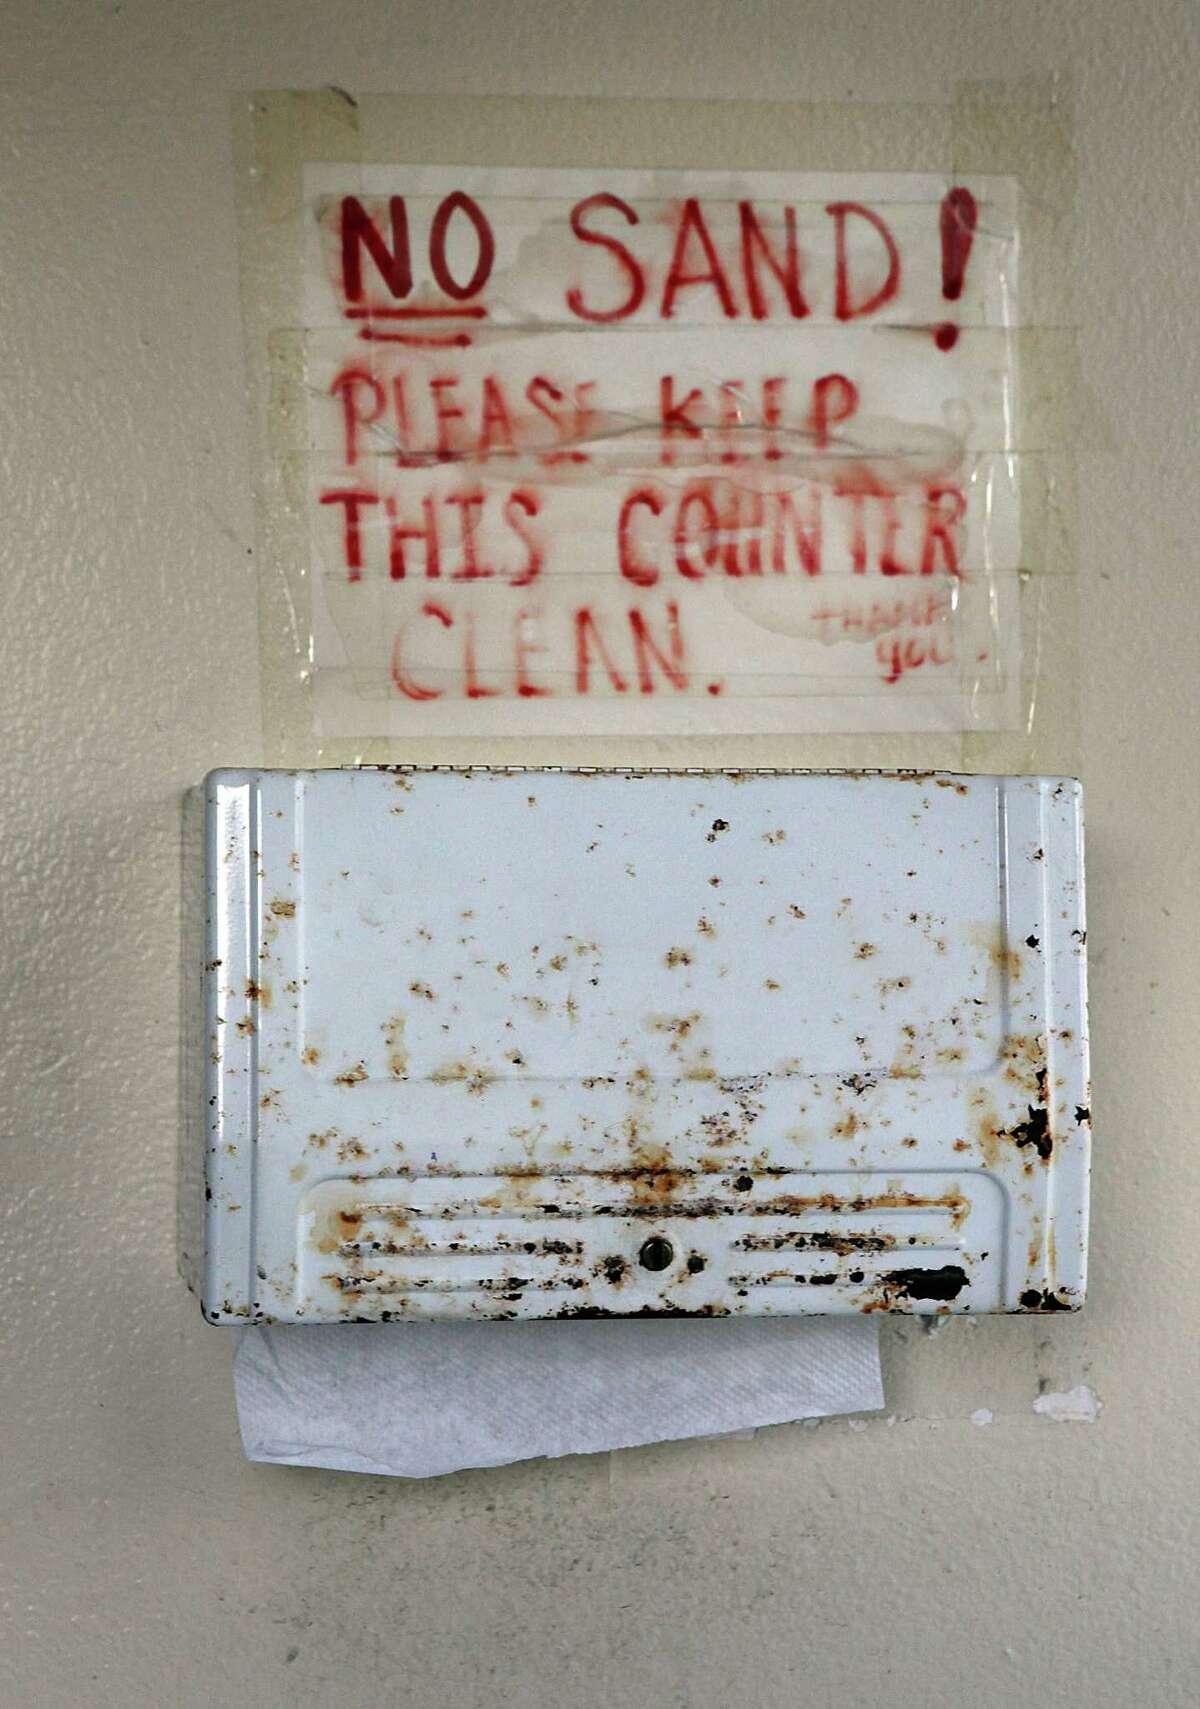 Towel dispenser seen in restroom at Douglass Park in San Francisco, Calif., on Wednesday, January 7, 2015.